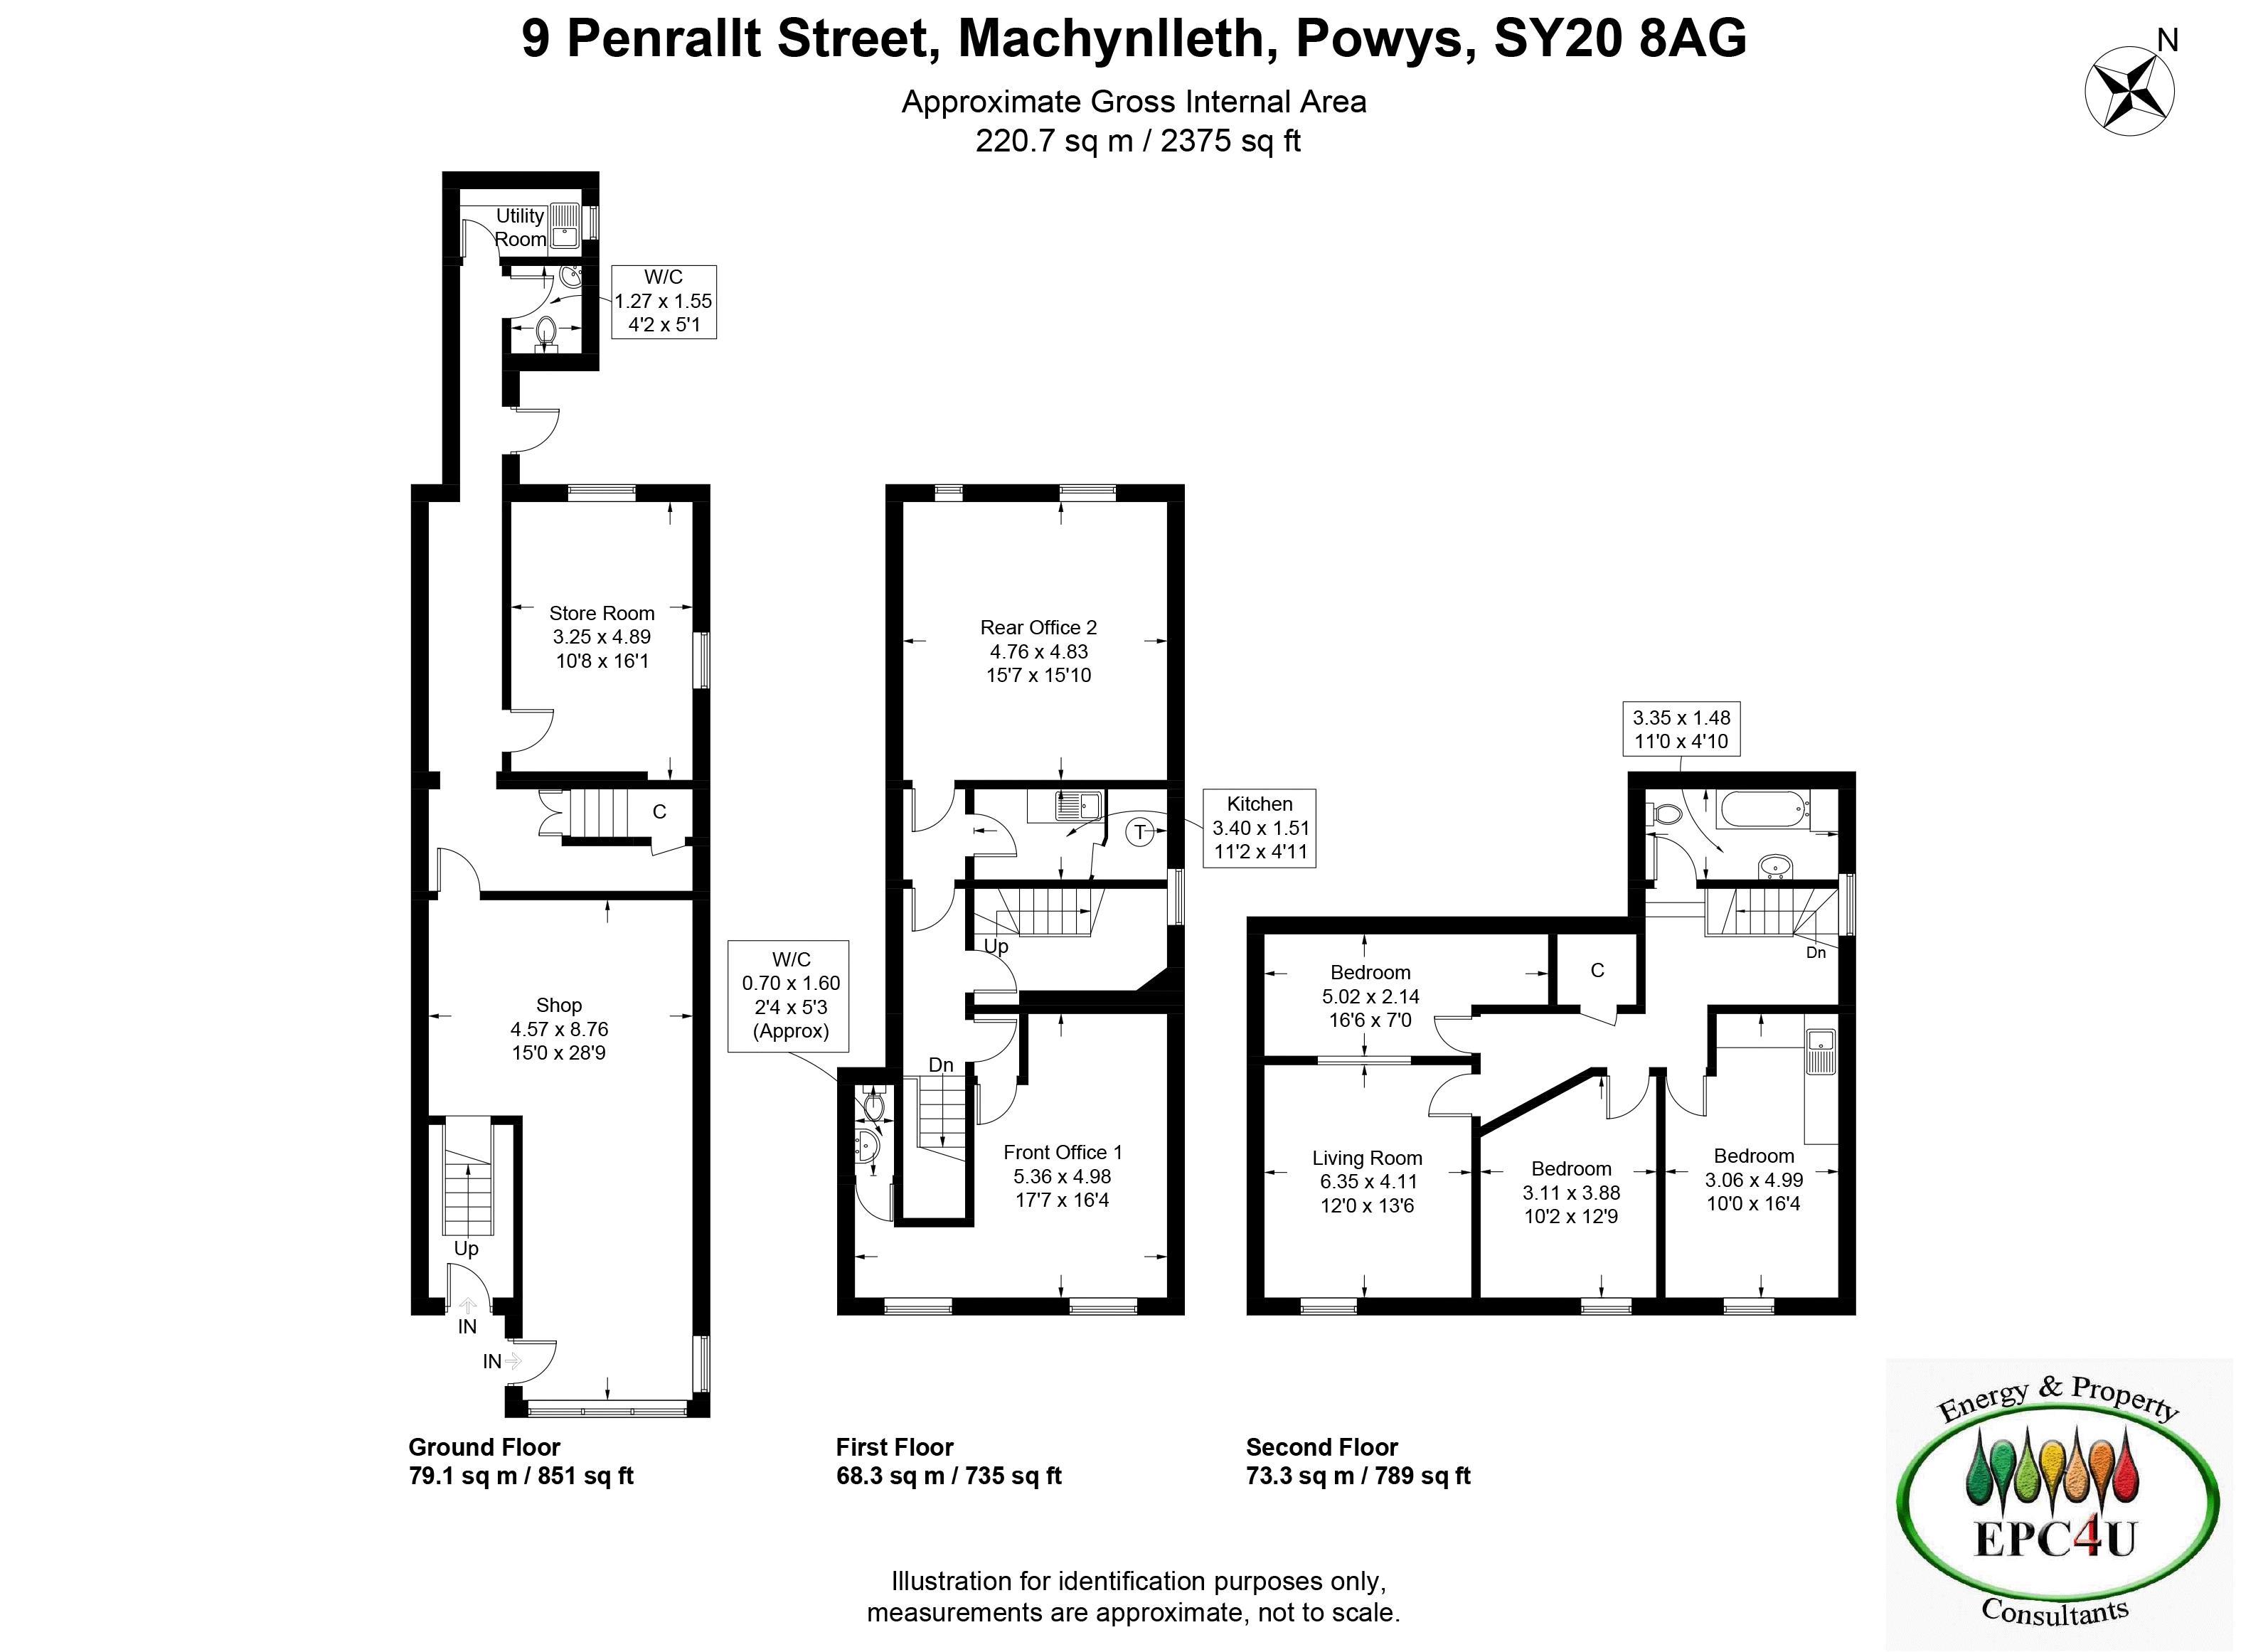 9 Penrallt Street